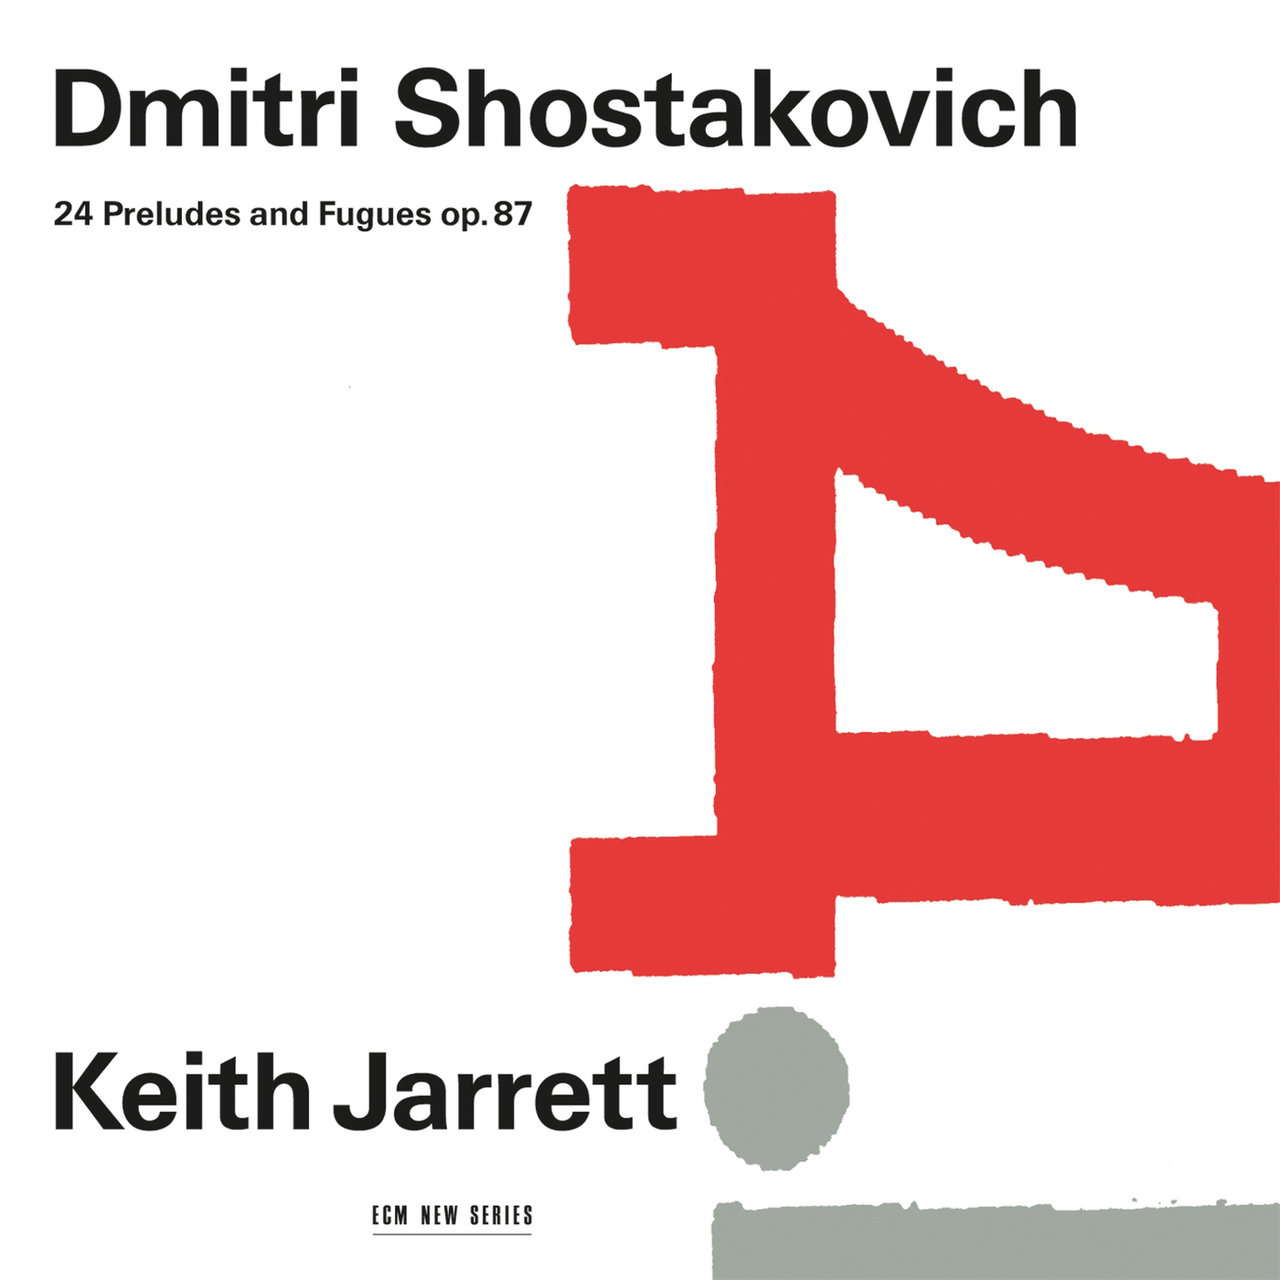 Keith Jarrett - Dmitri Shostakovich 24 Preludes And Fugues, Op. 87 (2017)